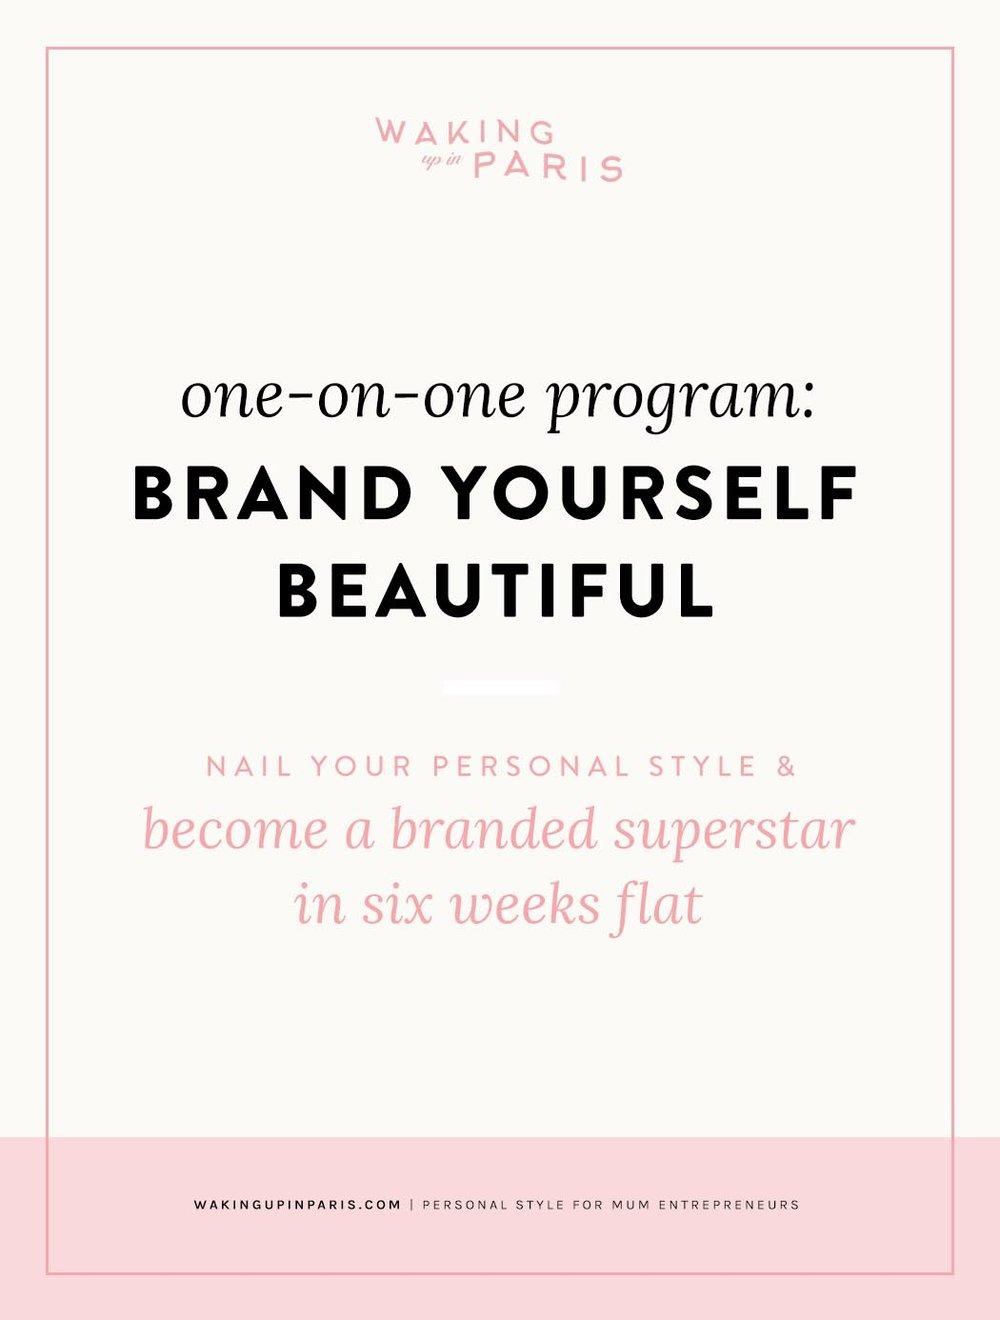 WUIP-clarissa-grace-personal-style-coach-online-mum-entrepreneur-business-brand-yourself-beautiful-10.jpg